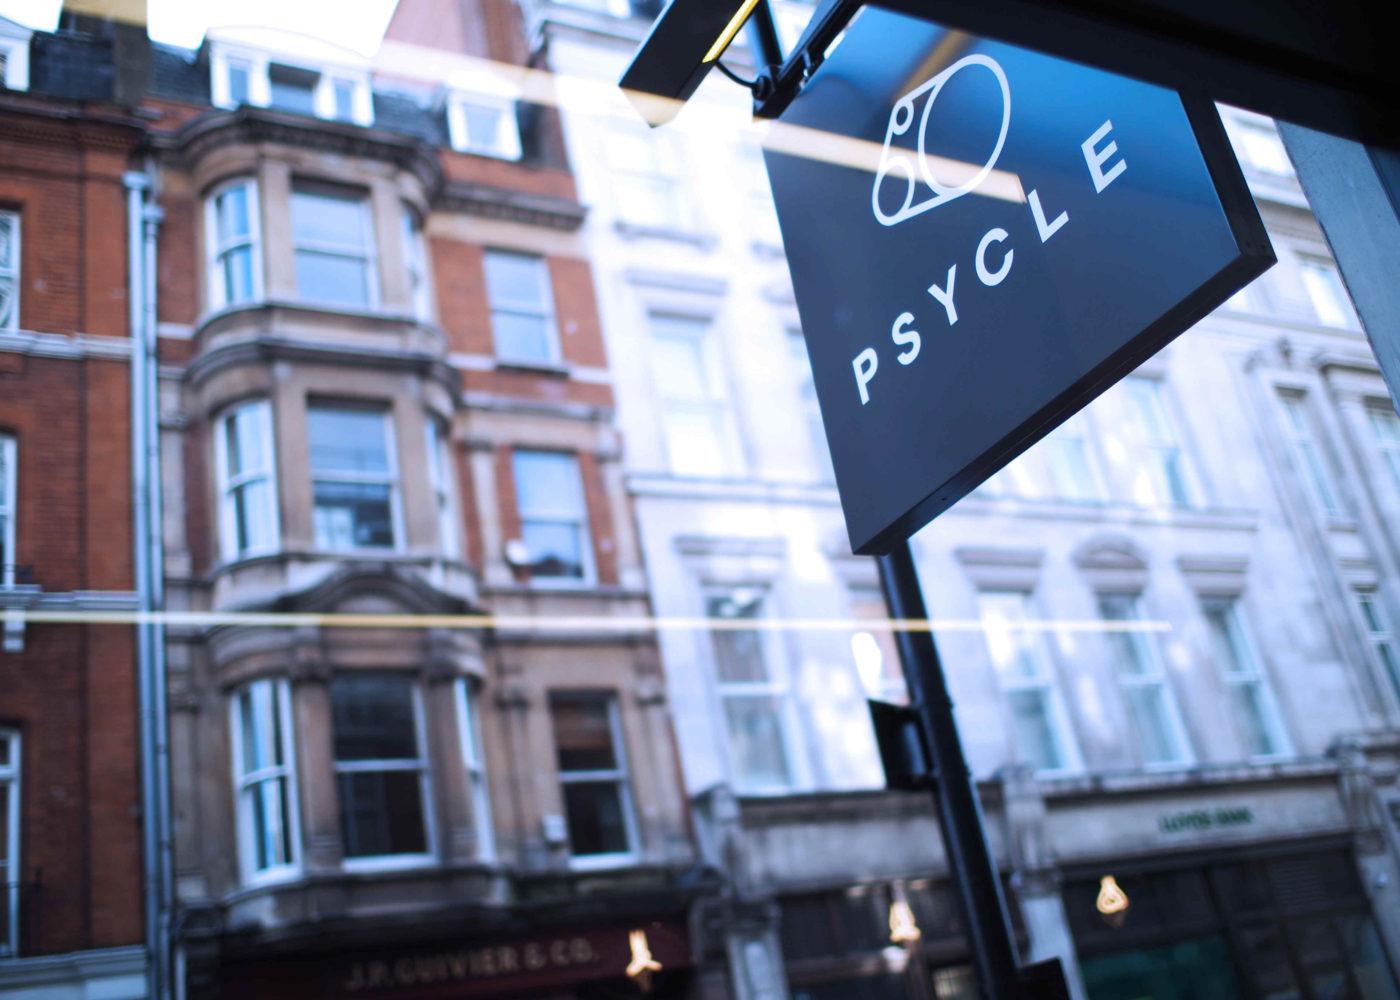 Pyscle-Mortimer-Street-5